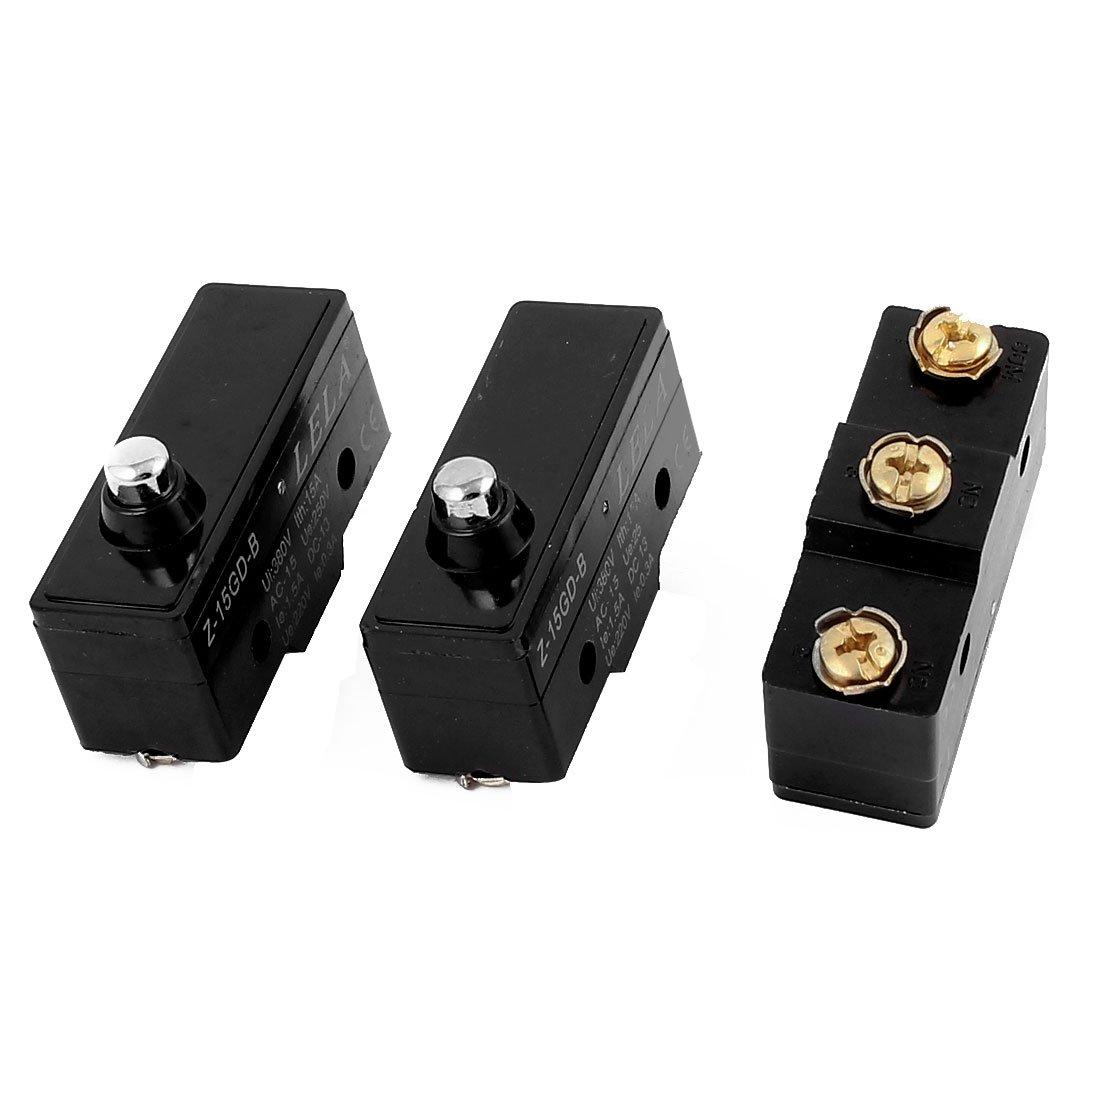 3Pcs Z-15GD-B SPDT 380V 15A Momentary Push Button  Plunger Control Limit Switch